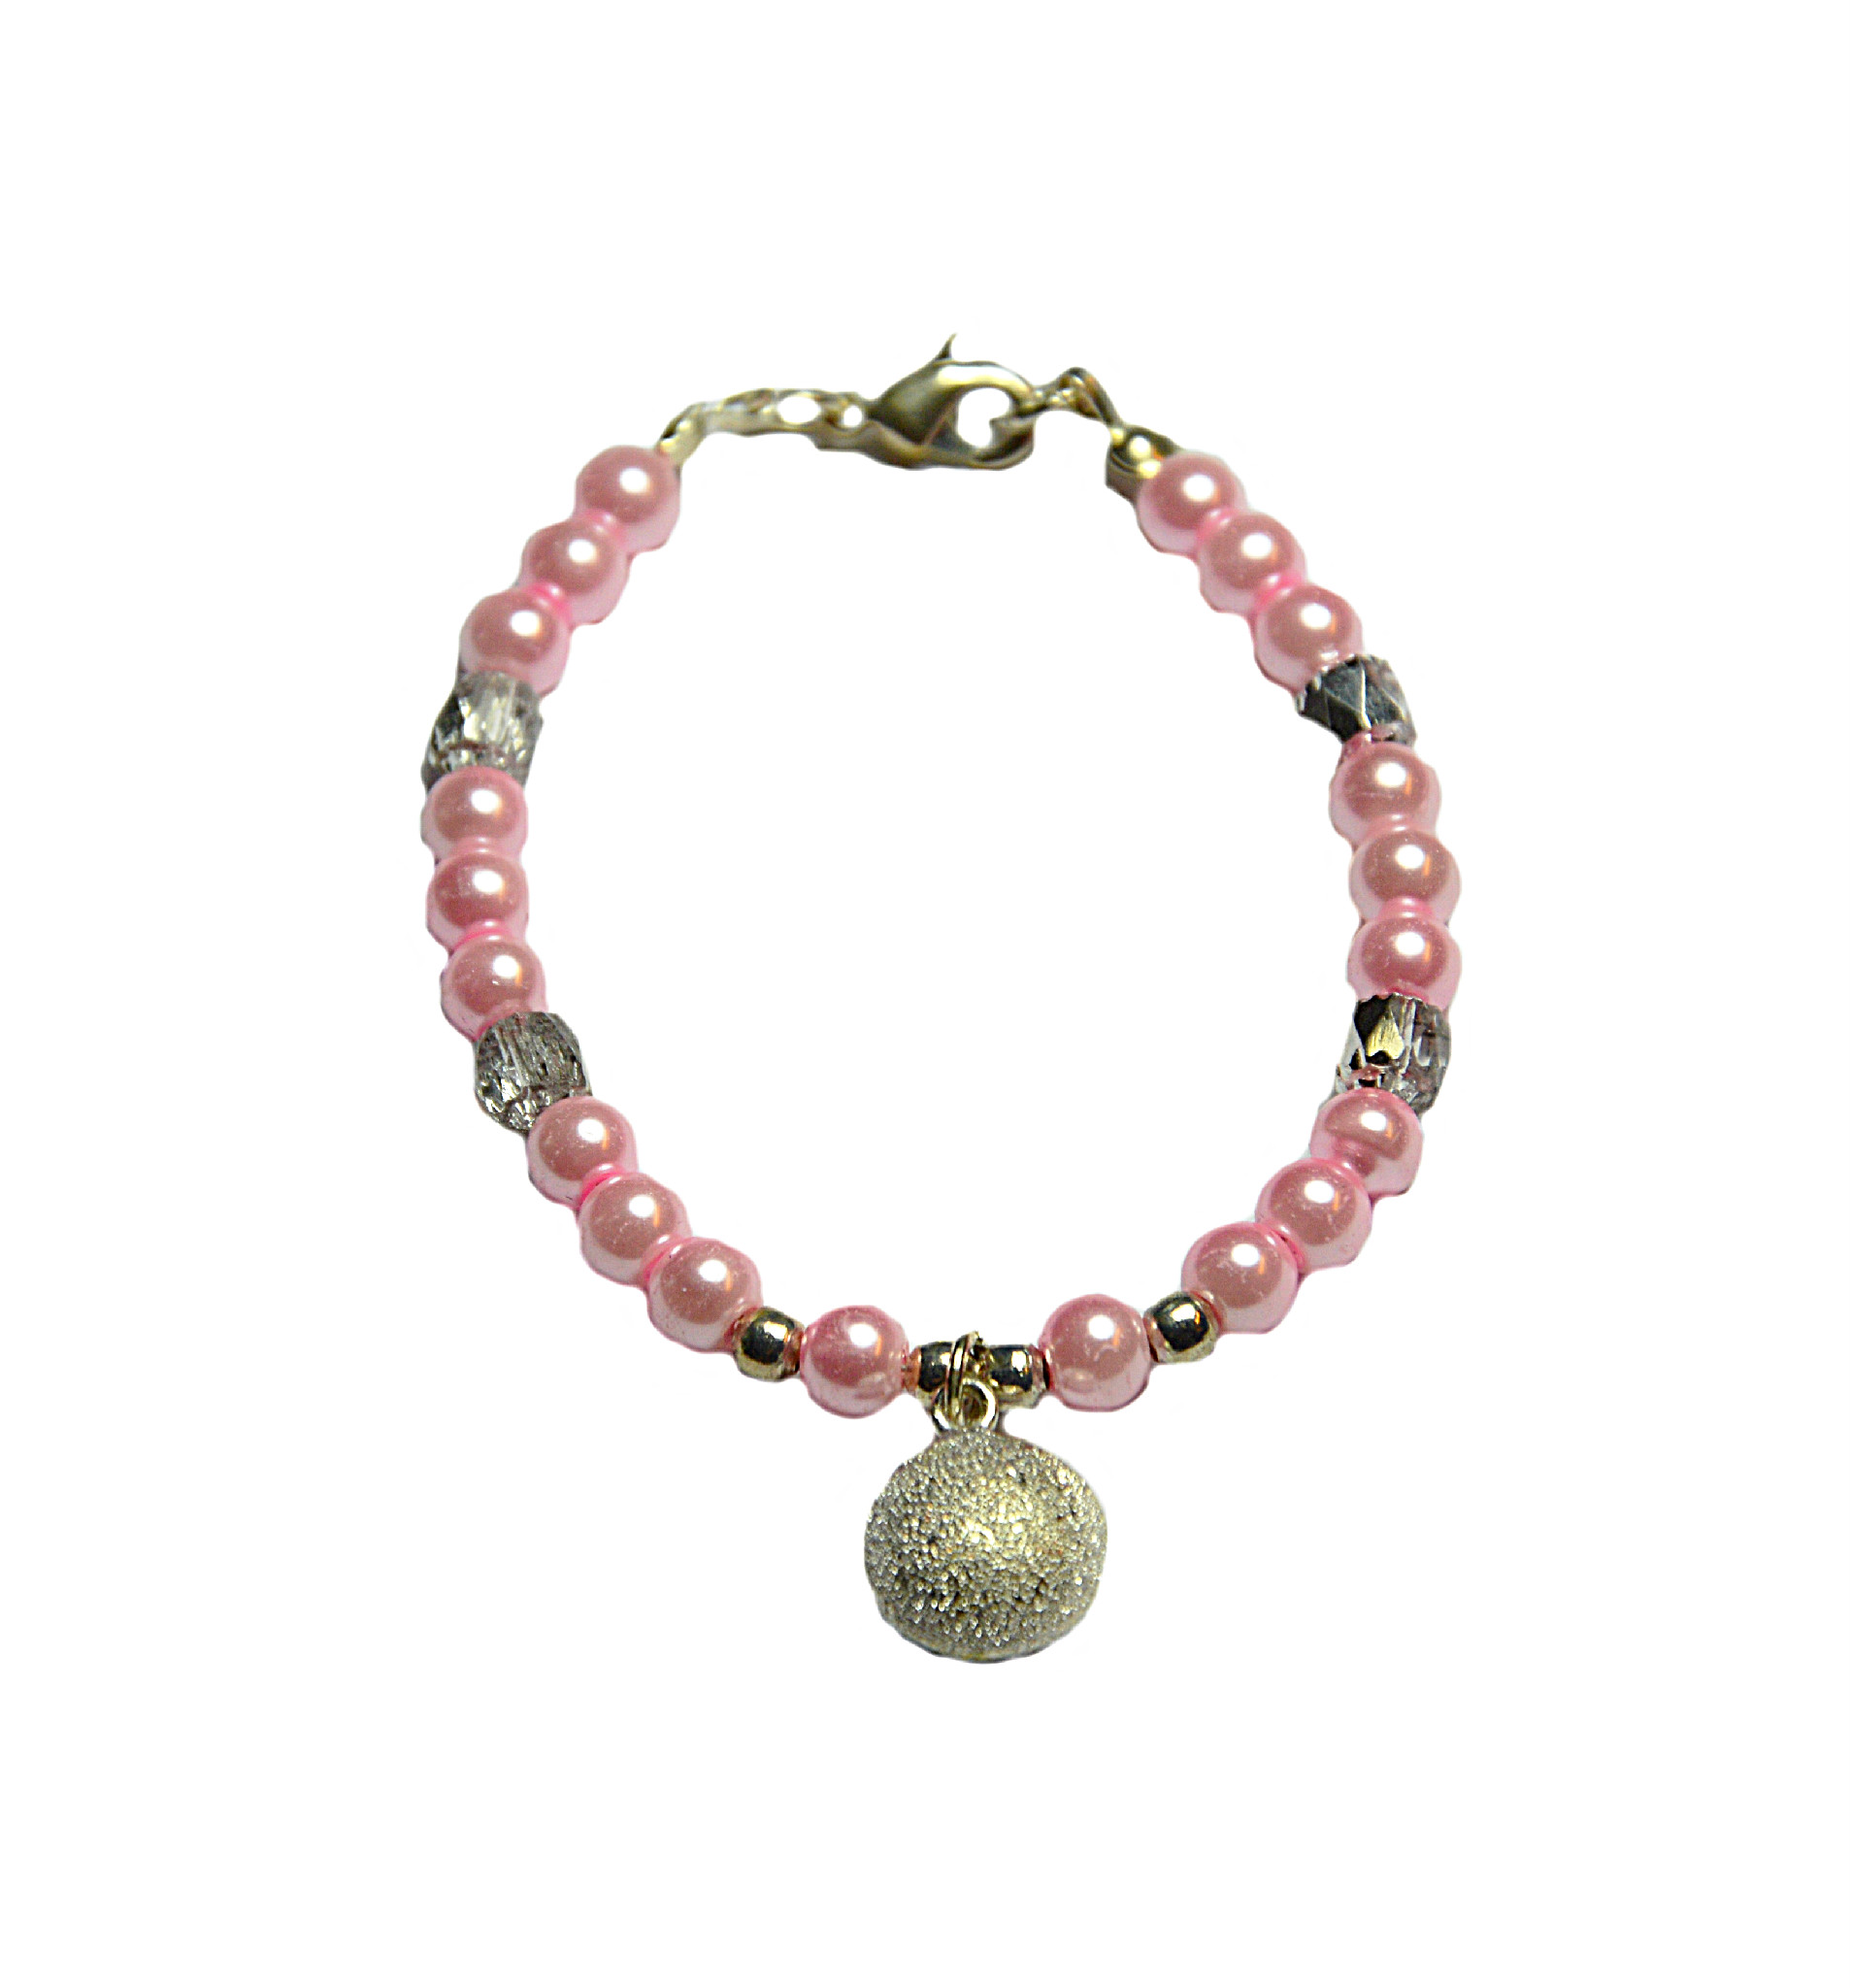 rosa armband - biggishop